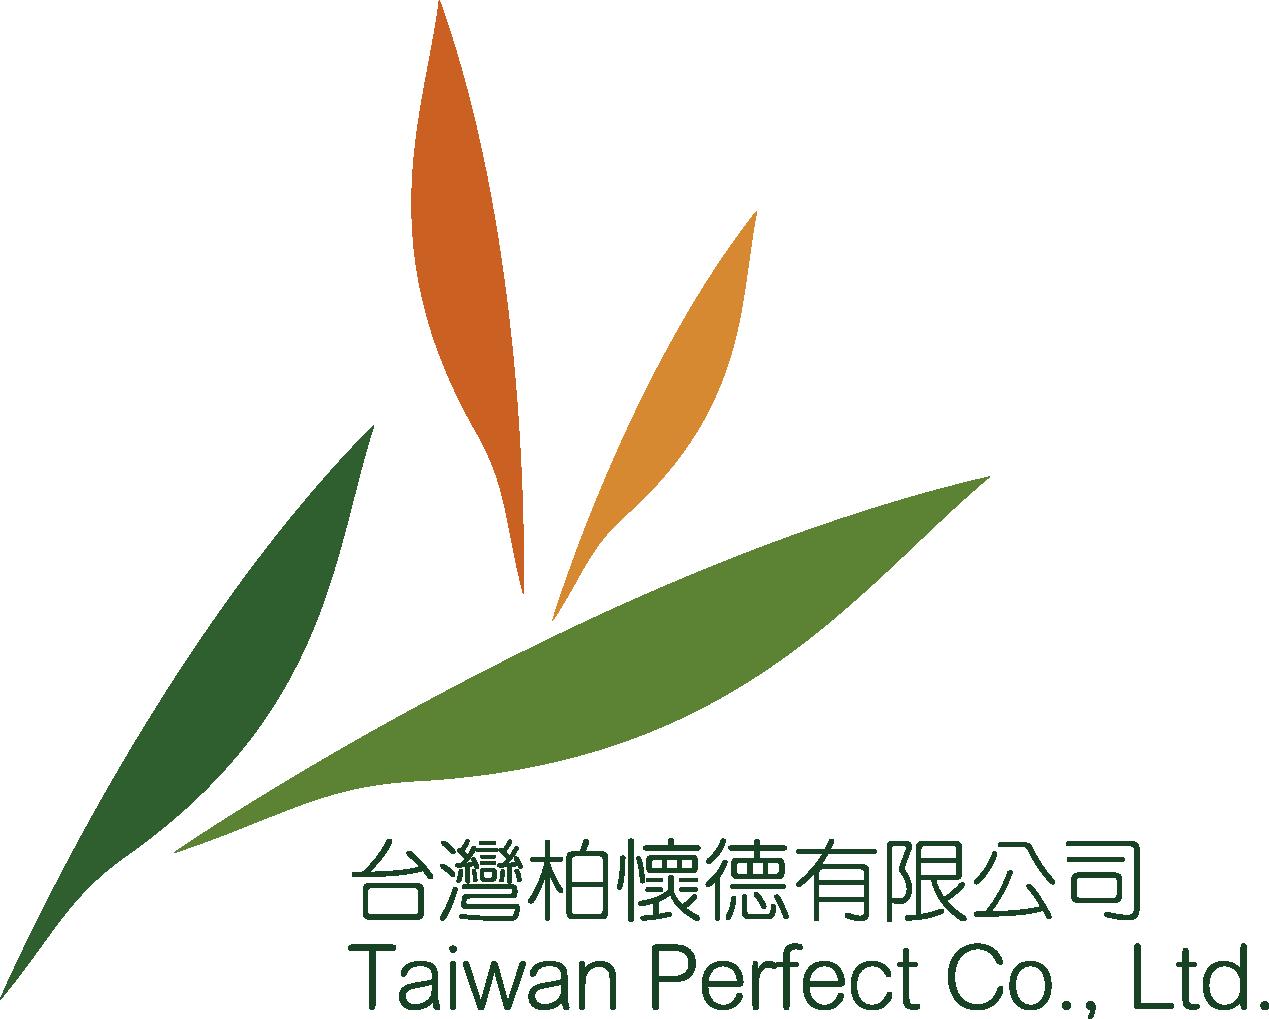 Taiwan Perfect Co. Ltd.